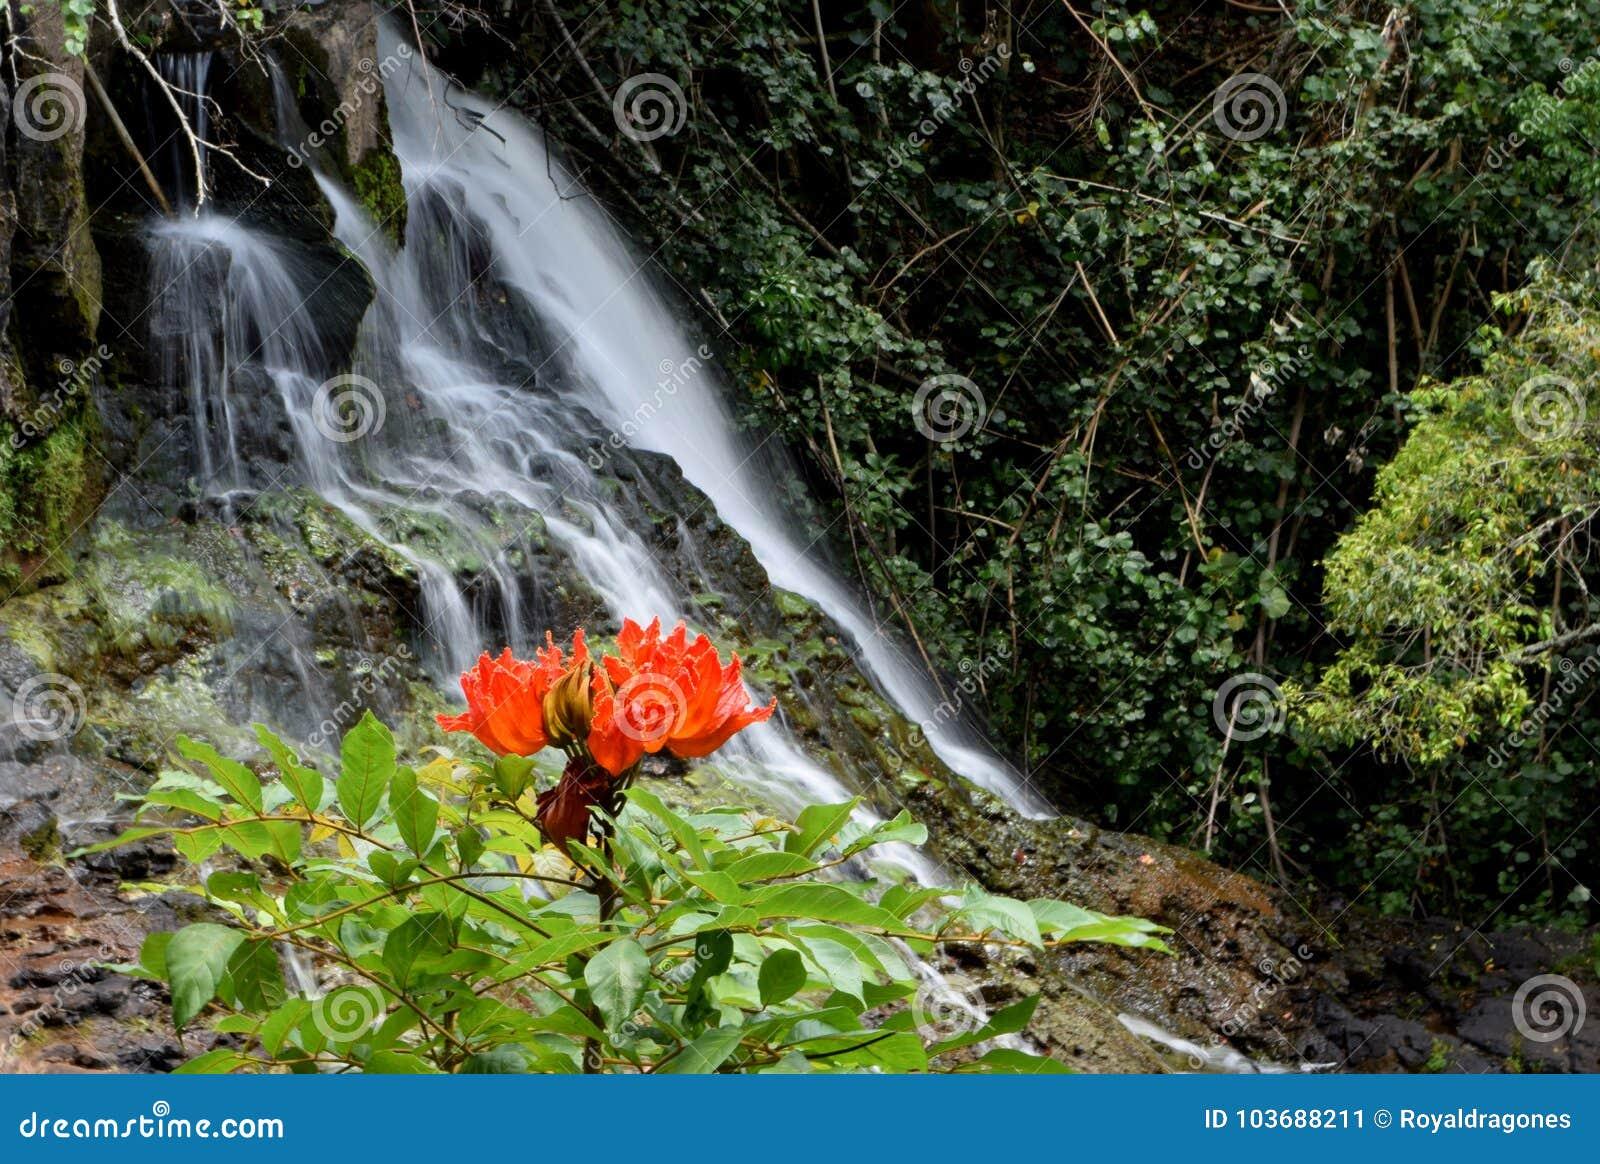 AfrikanTulip Tree blomma och vattenfall i Kauai Hawaii